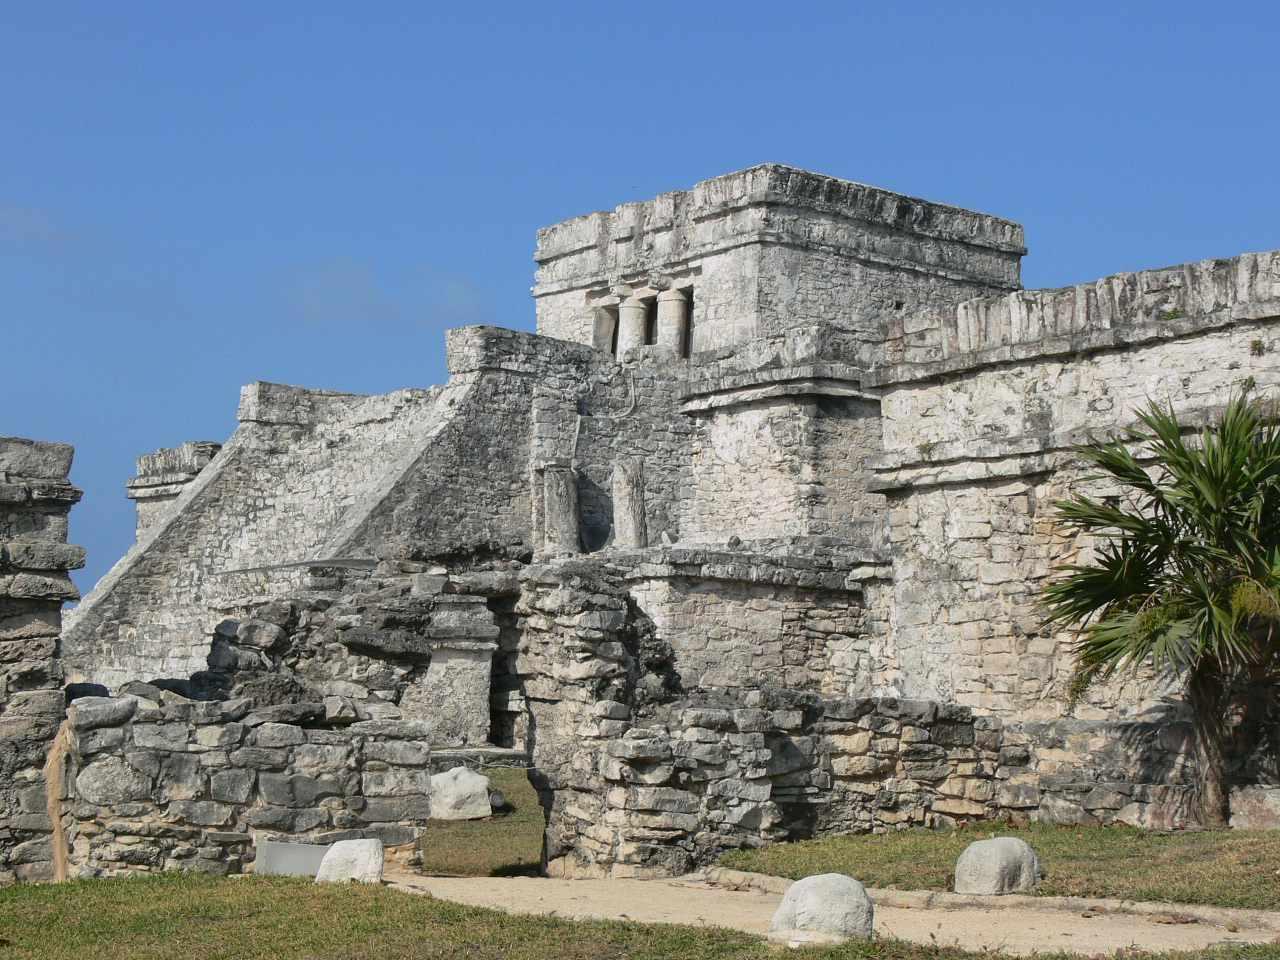 Photo of Castle pyramid in Tulum, Mexico